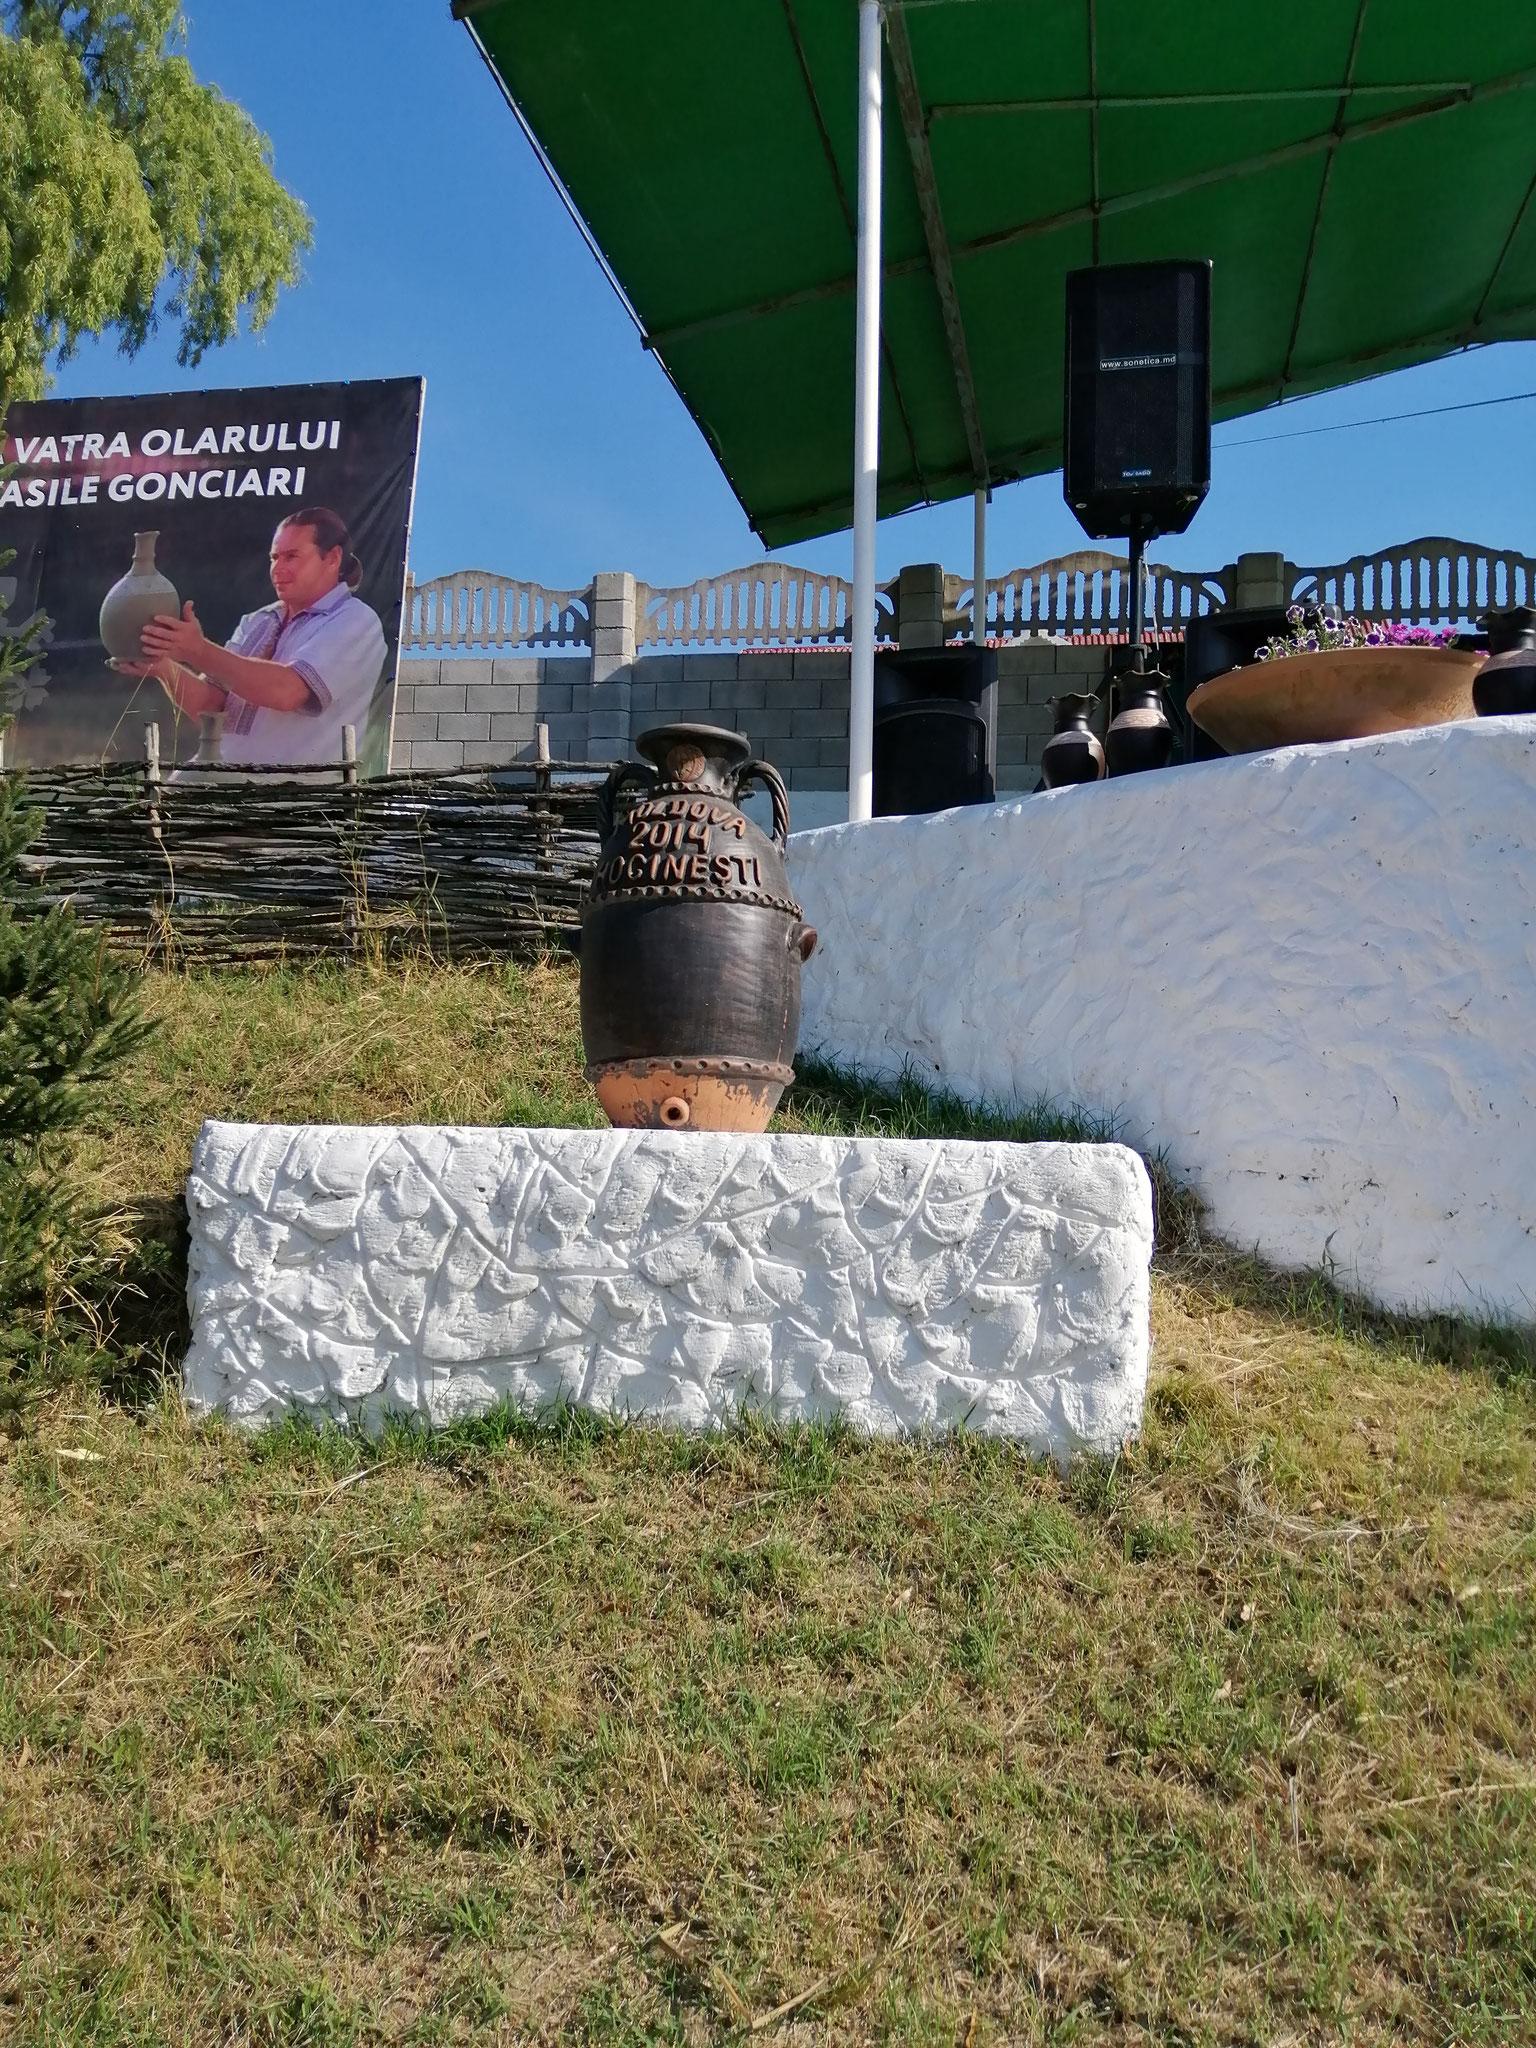 Hoginesti ,Moldova arte di ceramica festival